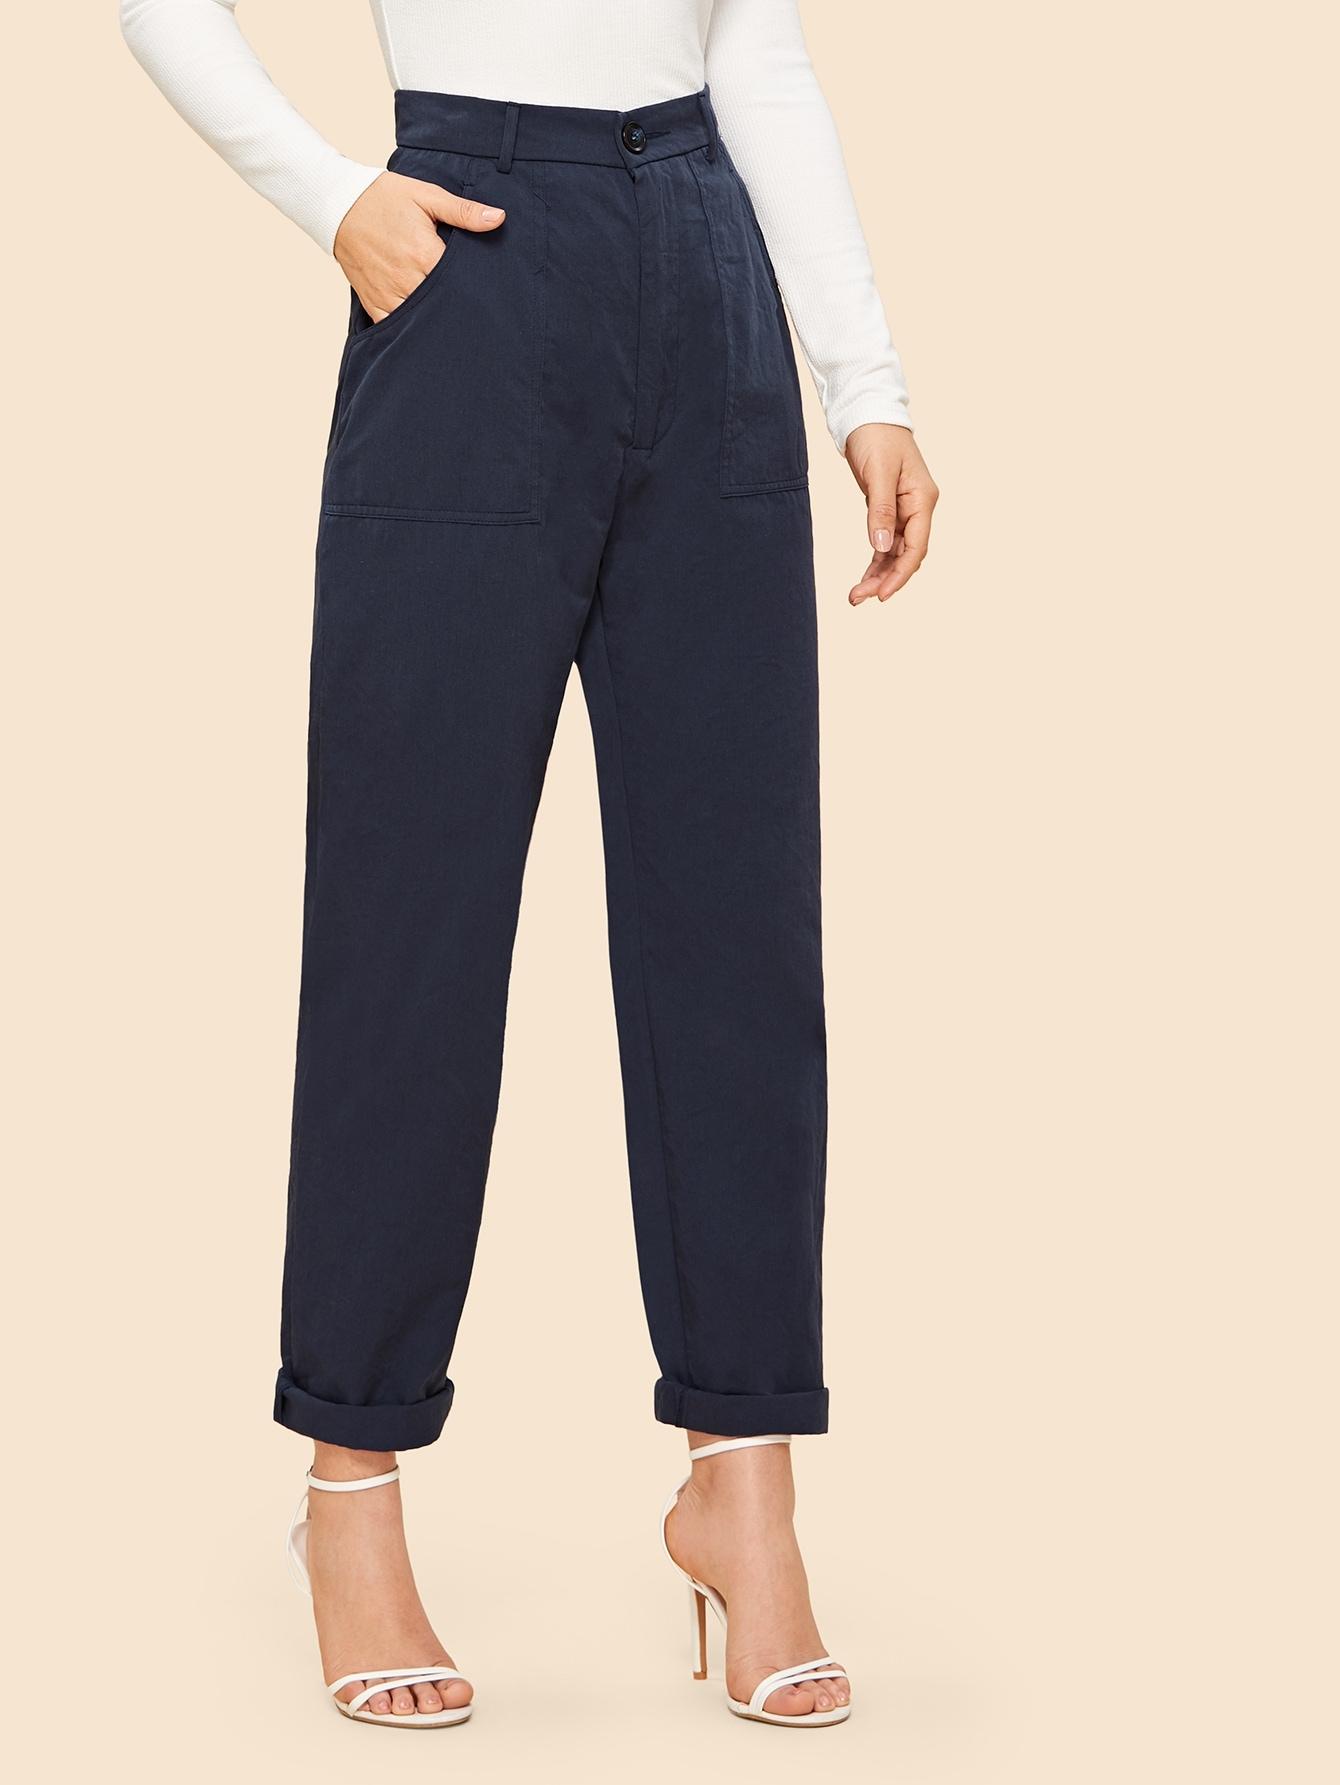 70s брюки с пуговицами и карманом thumbnail